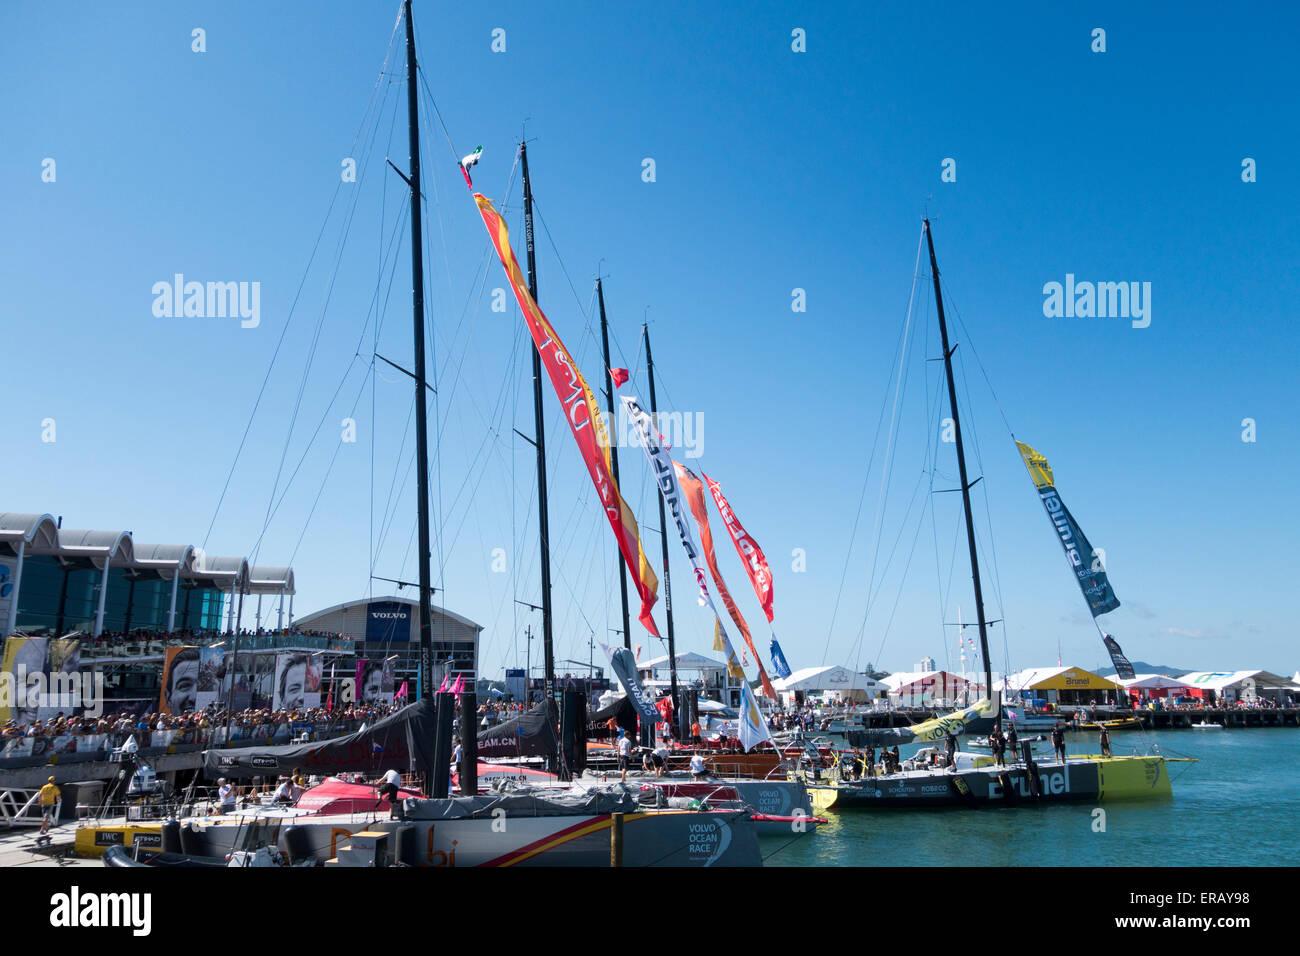 2015 Volvo Ocean Race, Auckland stopover, New Zealand - Stock Image